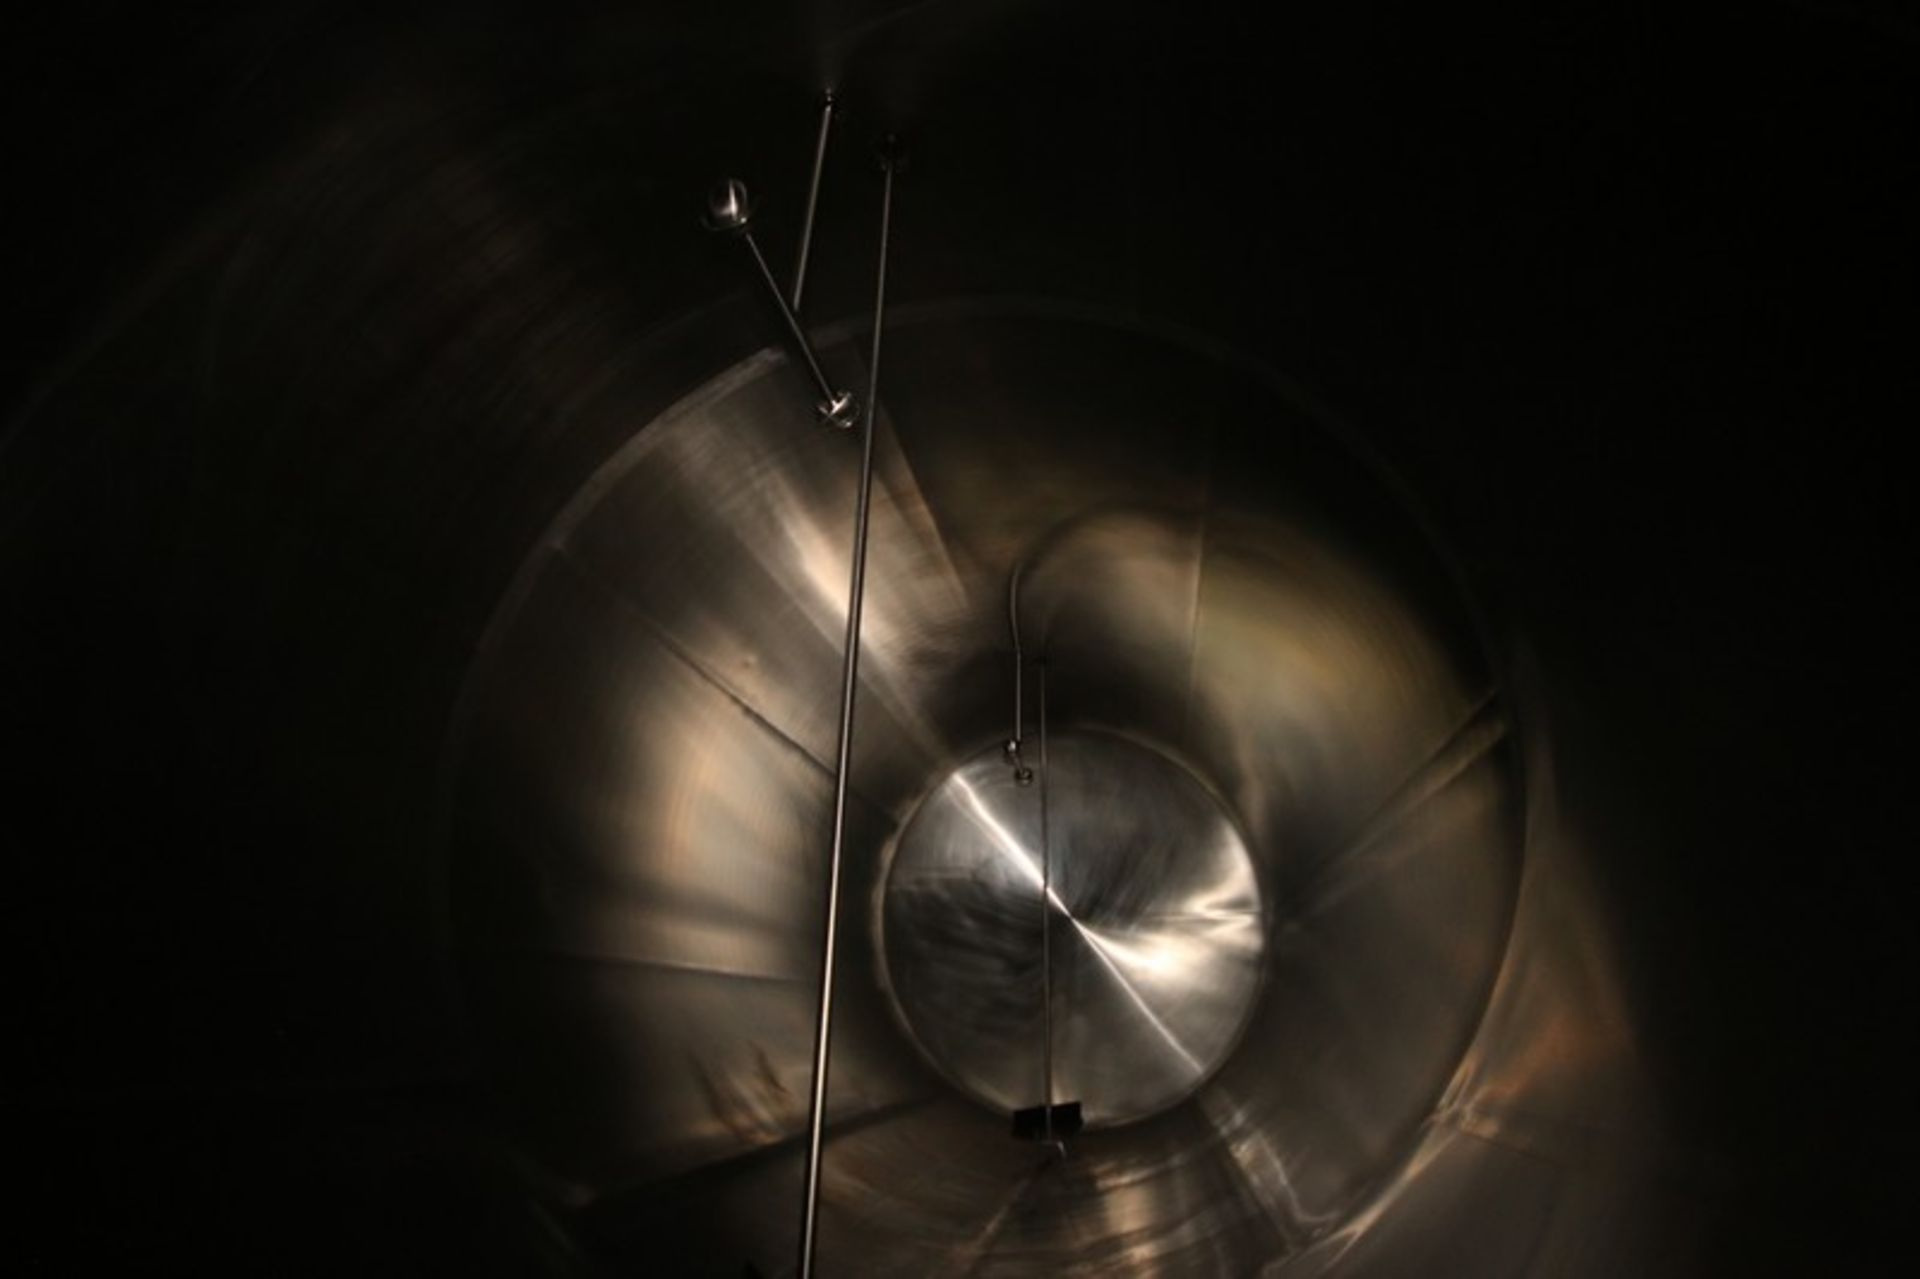 "Walker Aprox. 9,500 Gal. S/S Horizontal Tank, S/N 1520, Tank Dims.: Aprox. 108"" Diameter x 20' Long, - Image 4 of 7"